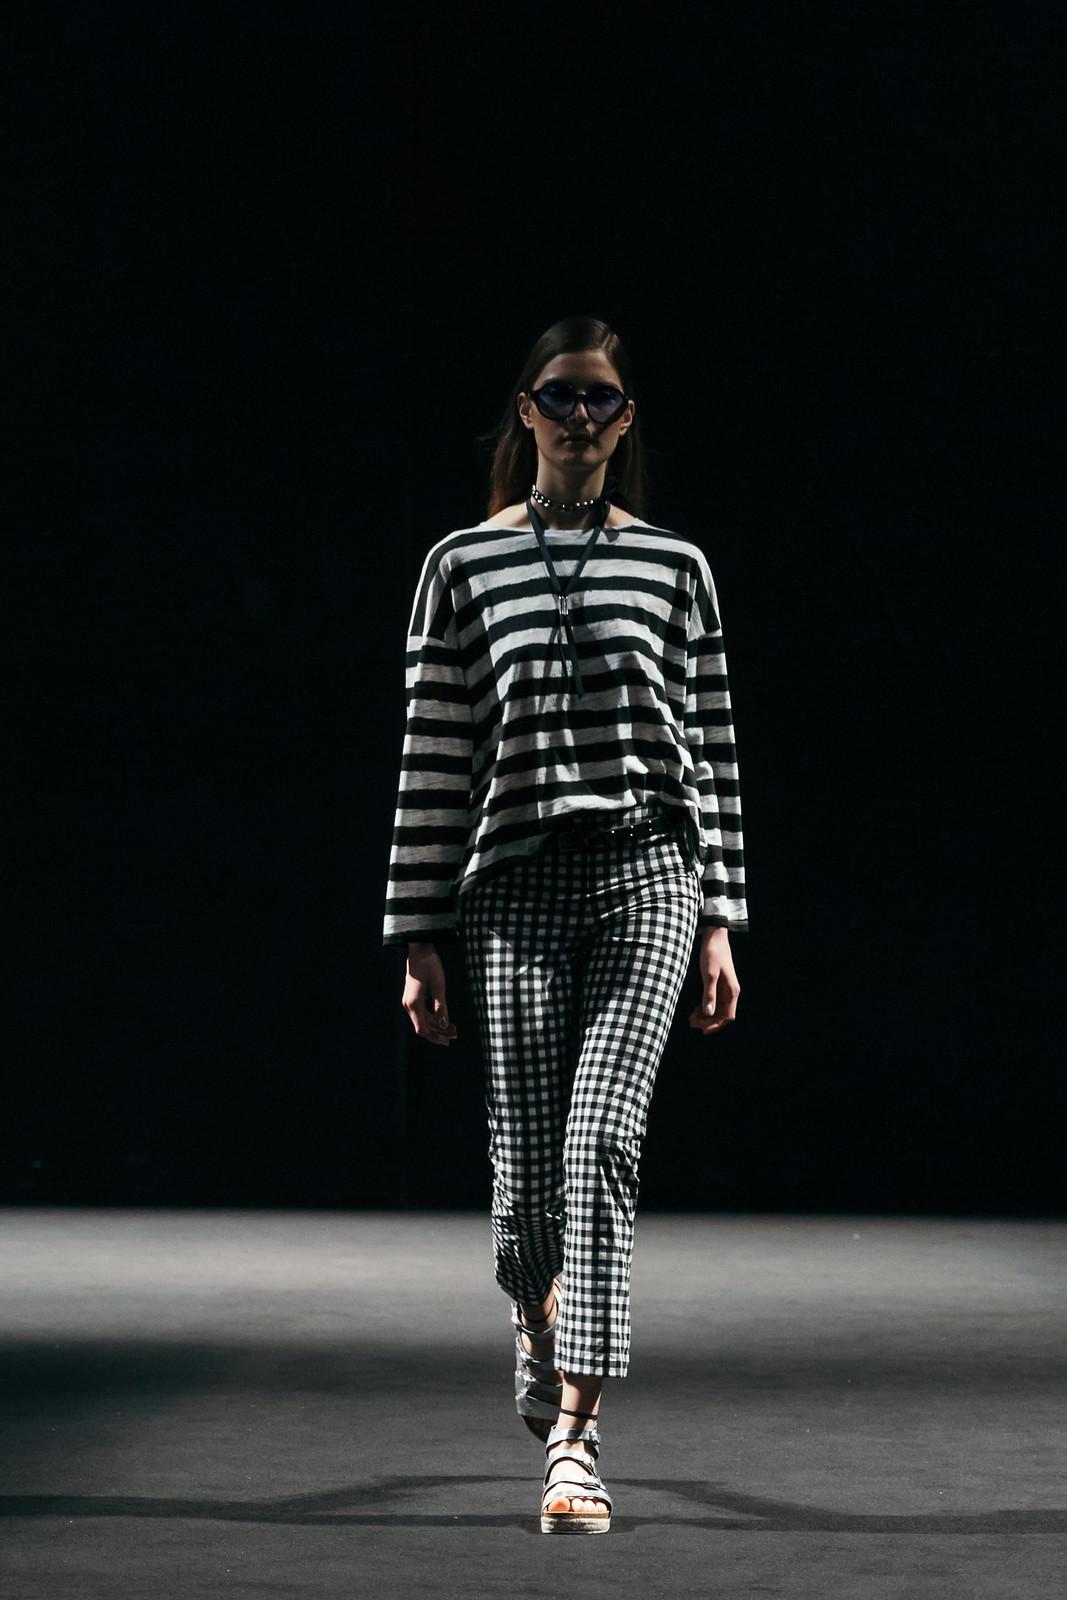 Jessie Chanes - Seams for a desire - 080 Bacelona Fashion #080bcnfasion -32